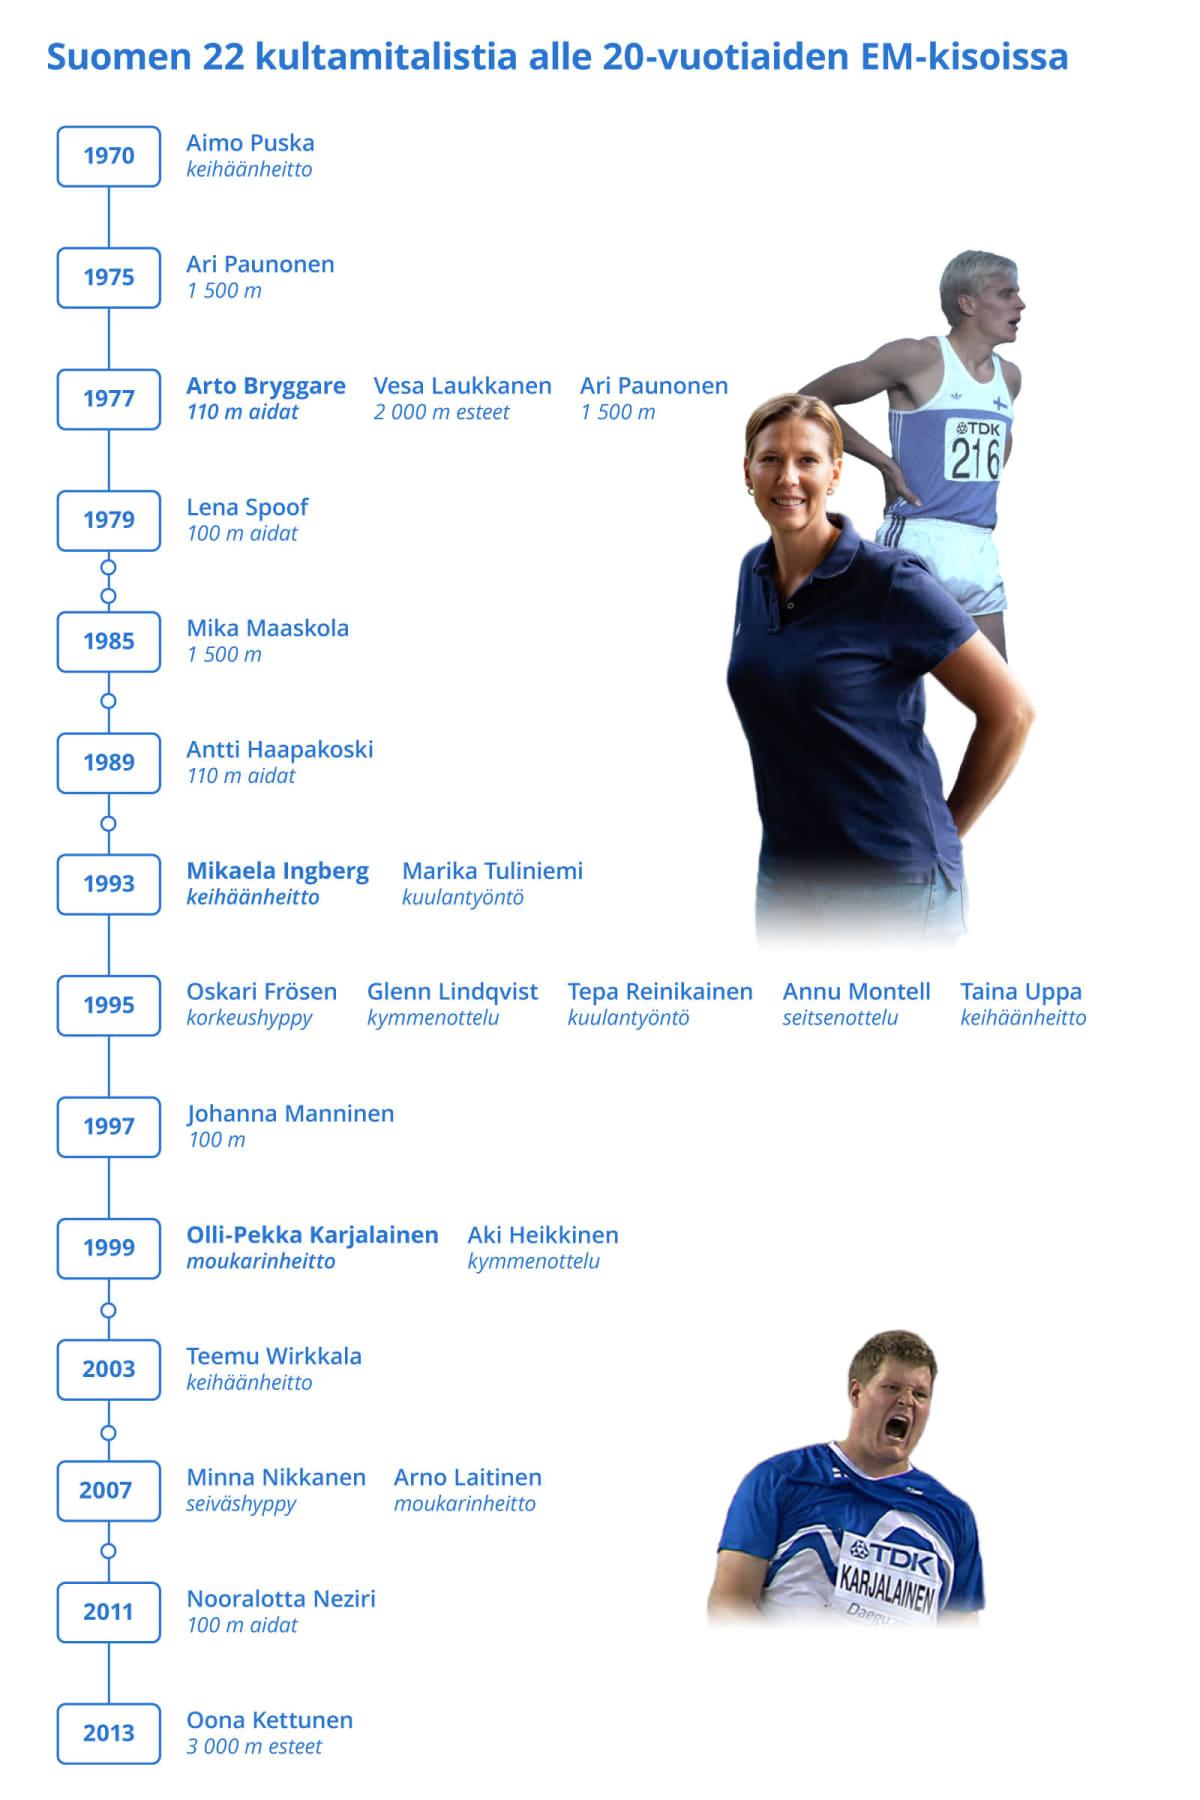 Suomen 22 kultamitalistia alle 20-vuotiaiden EM-kisoissa